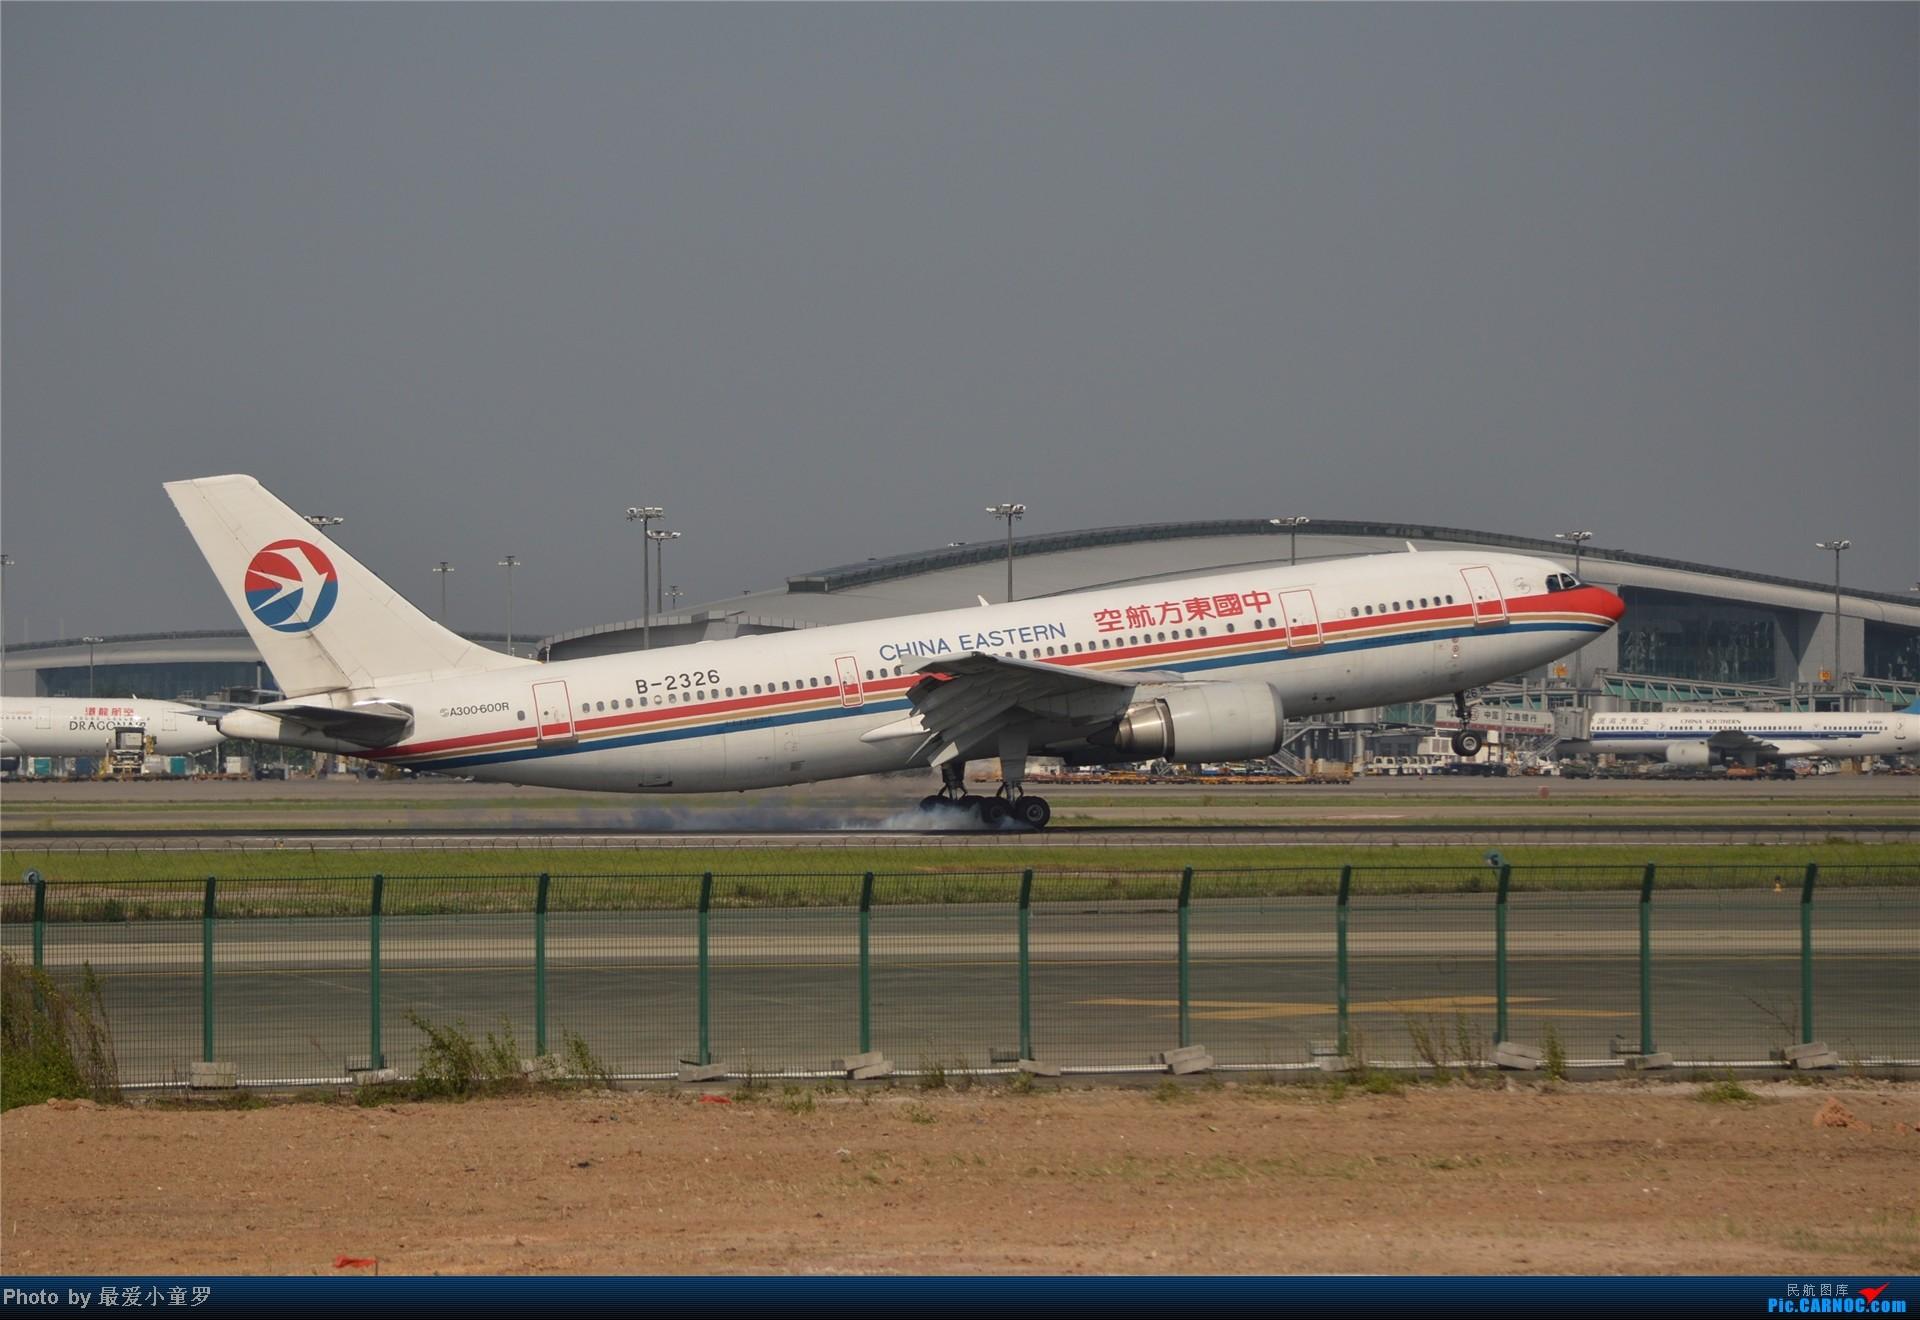 Re:[原创]炒冷饭贴之13年10月2日CAN拍机杂图系列 AIRBUS A300-B4-600 B-2326 中国广州白云机场